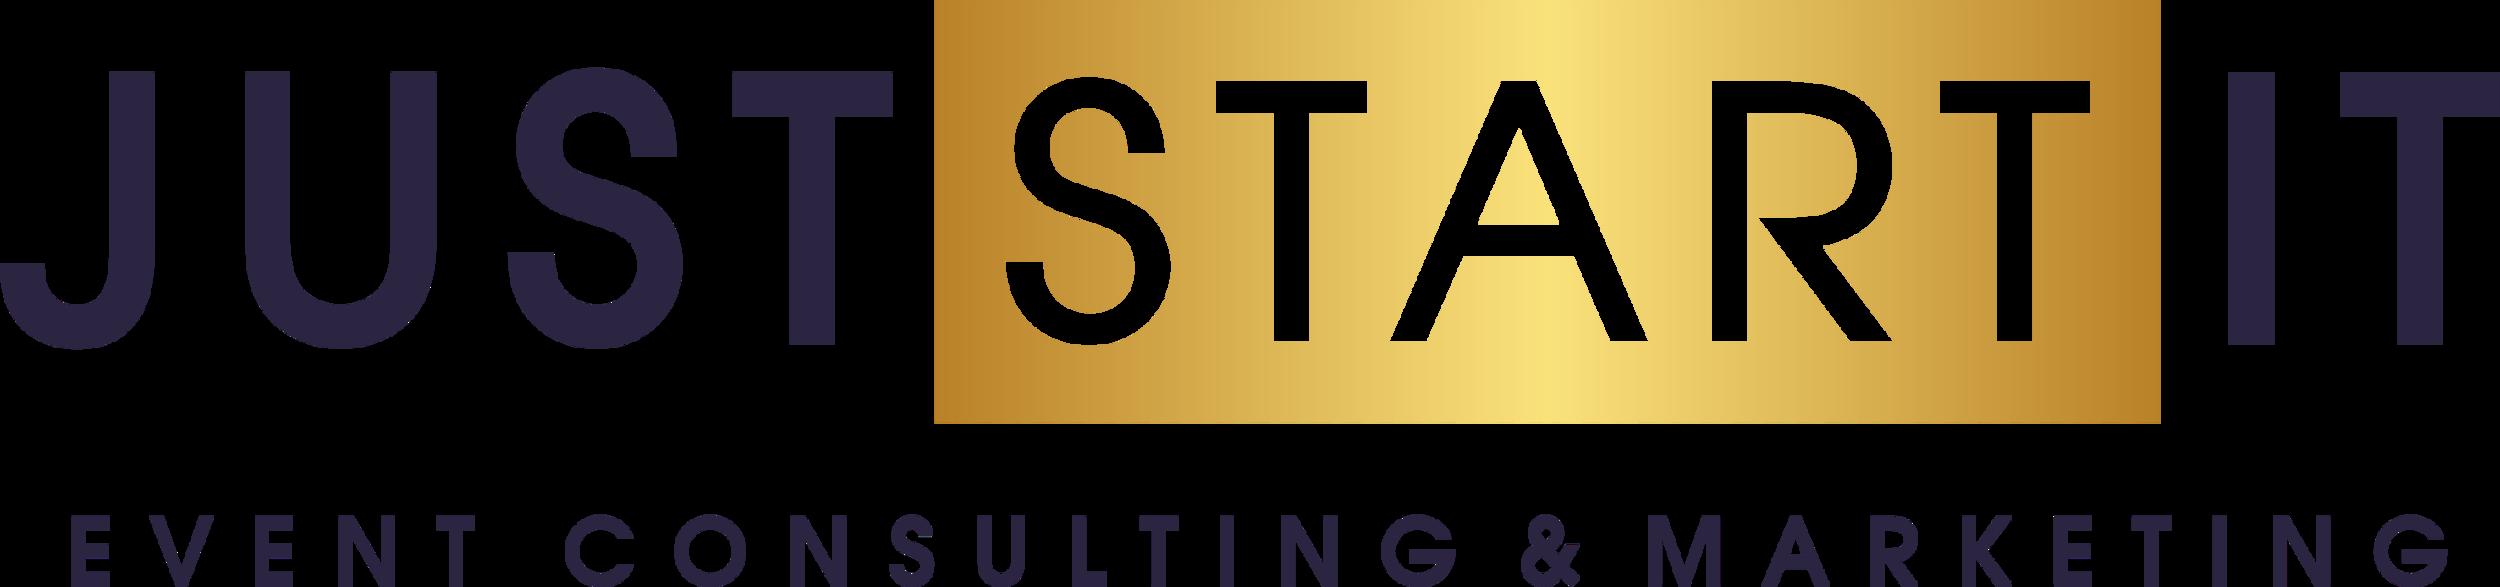 Logo_Just Start It_blue_gold.png